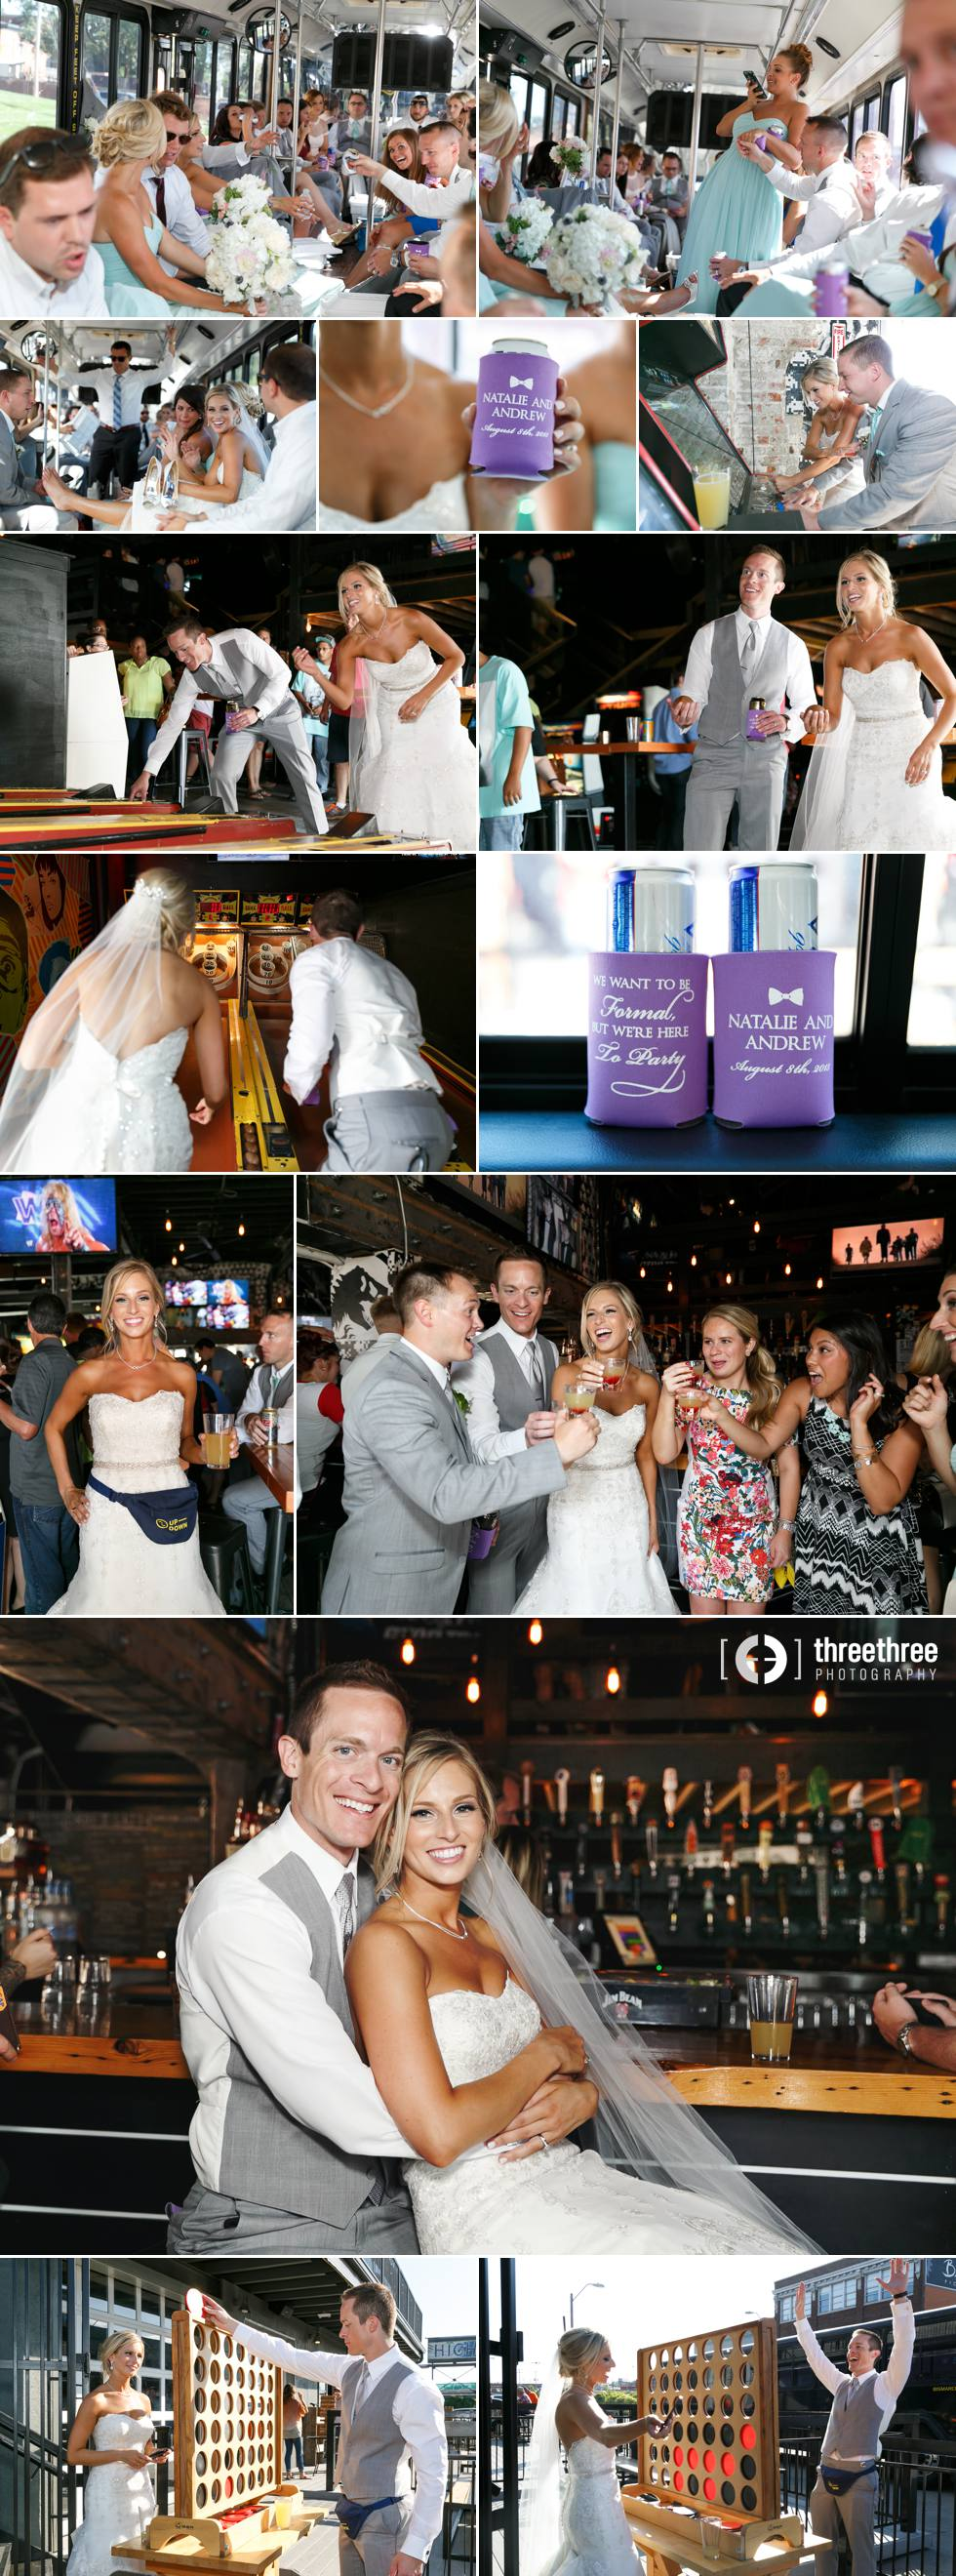 Natalie_AJ_wedding 12